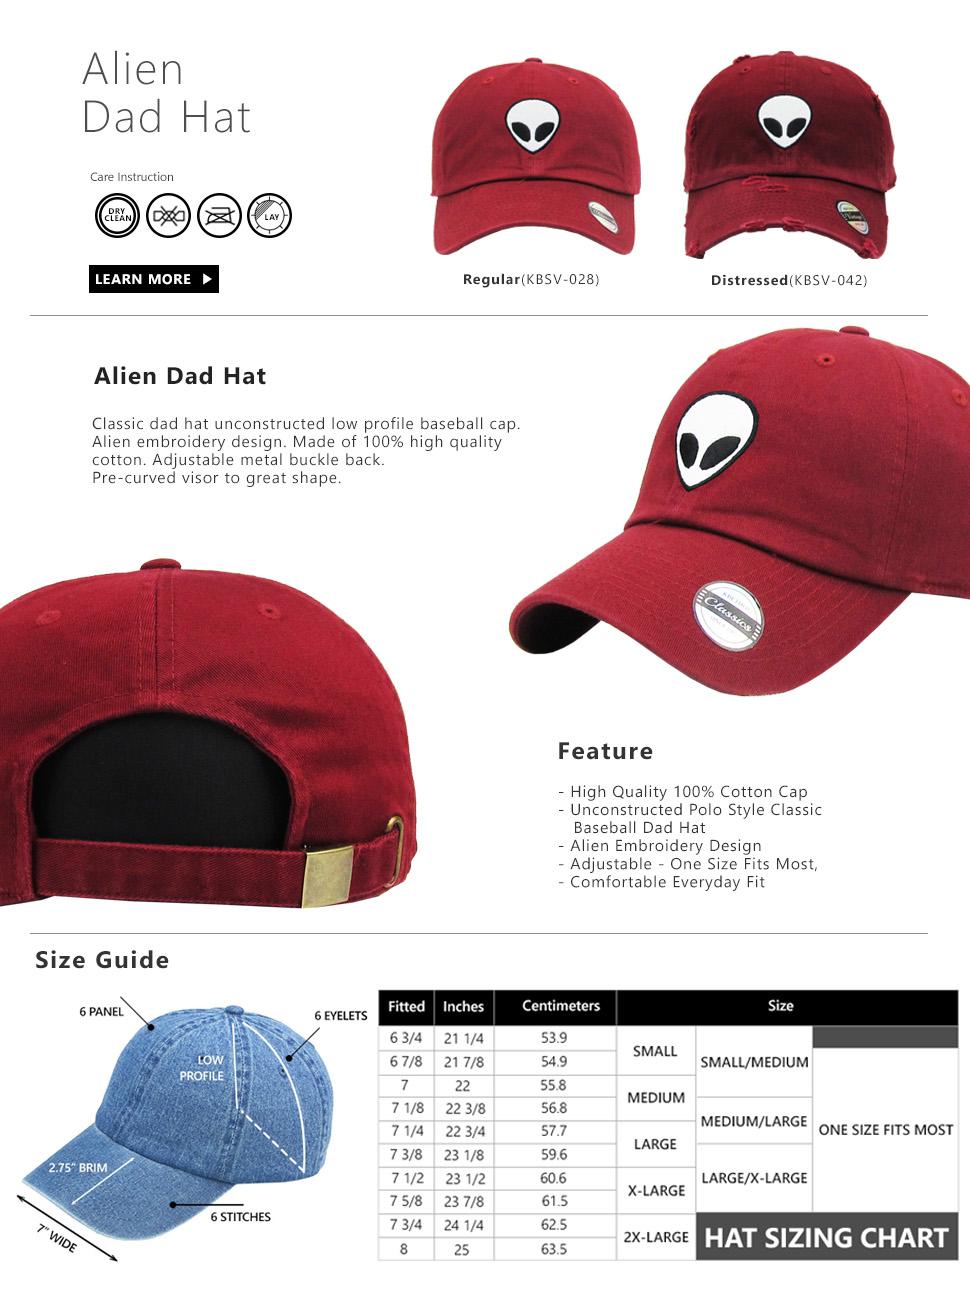 cdfa11a16f9 KBSV-028 BUR Alien Dad Hat Baseball Cap Polo Style Adjustable ...